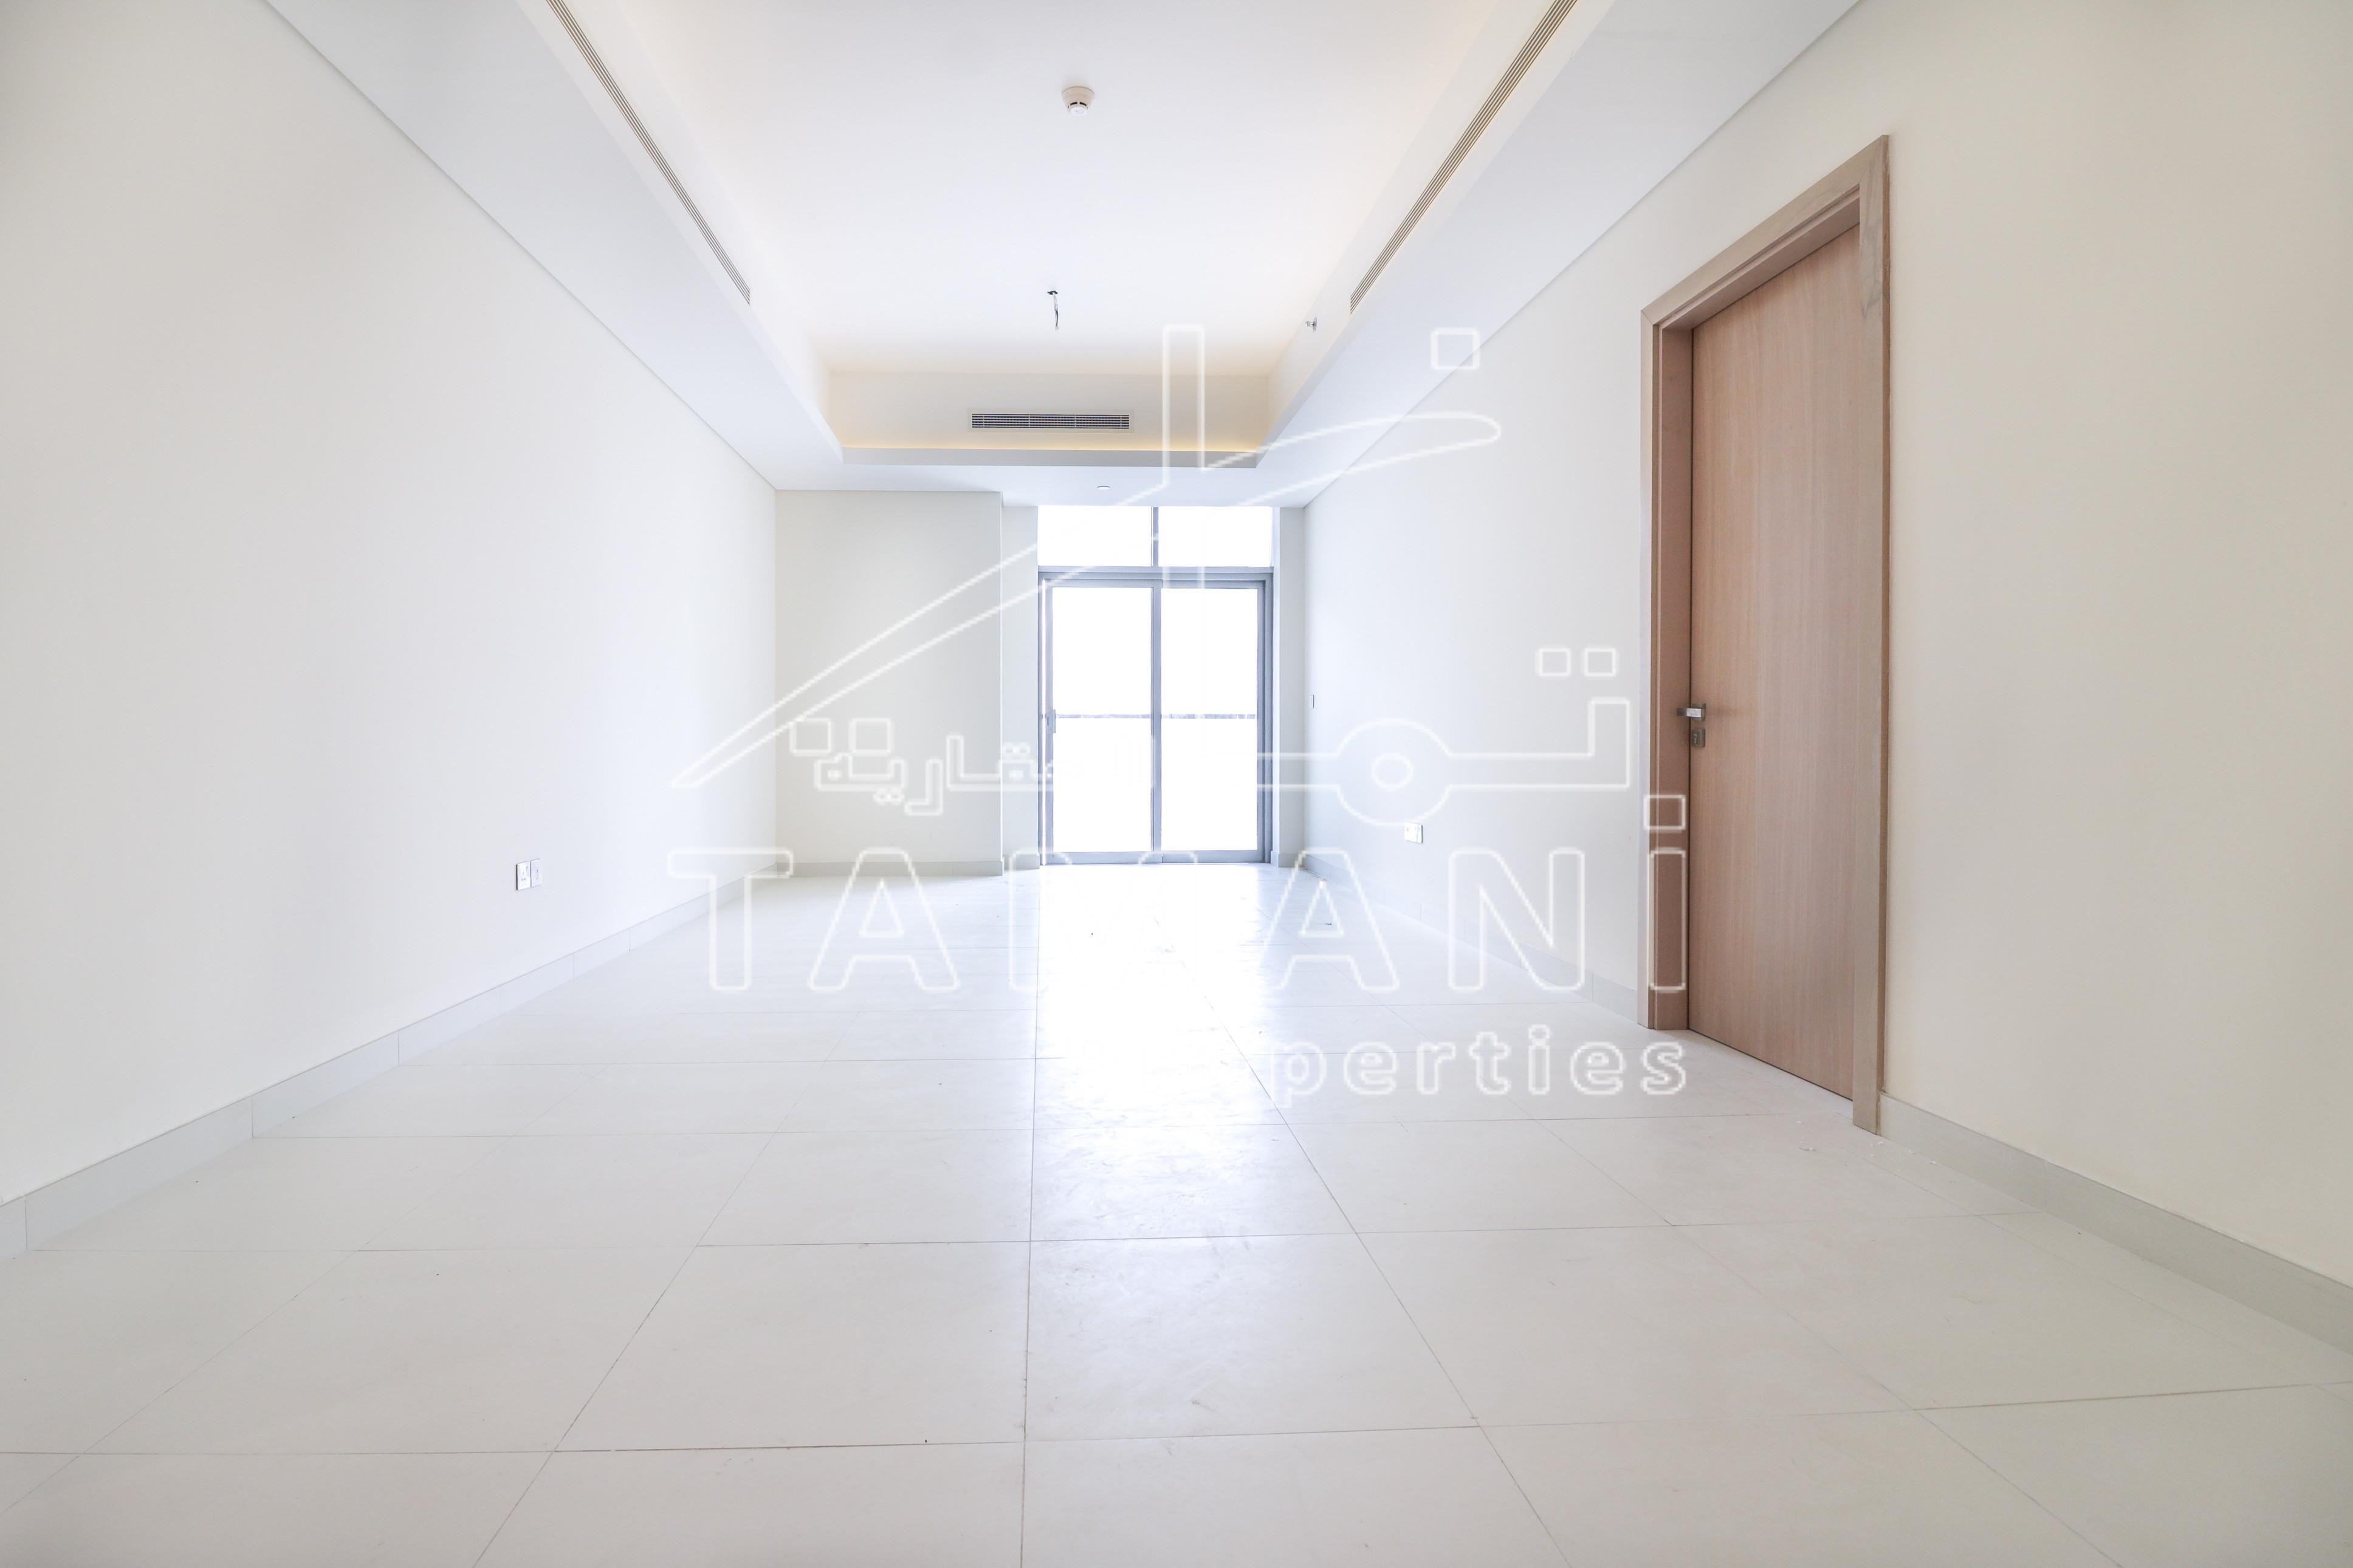 Exclusive offer!New 2 BR near Dubai Mall - Mada Residences by ARTAR